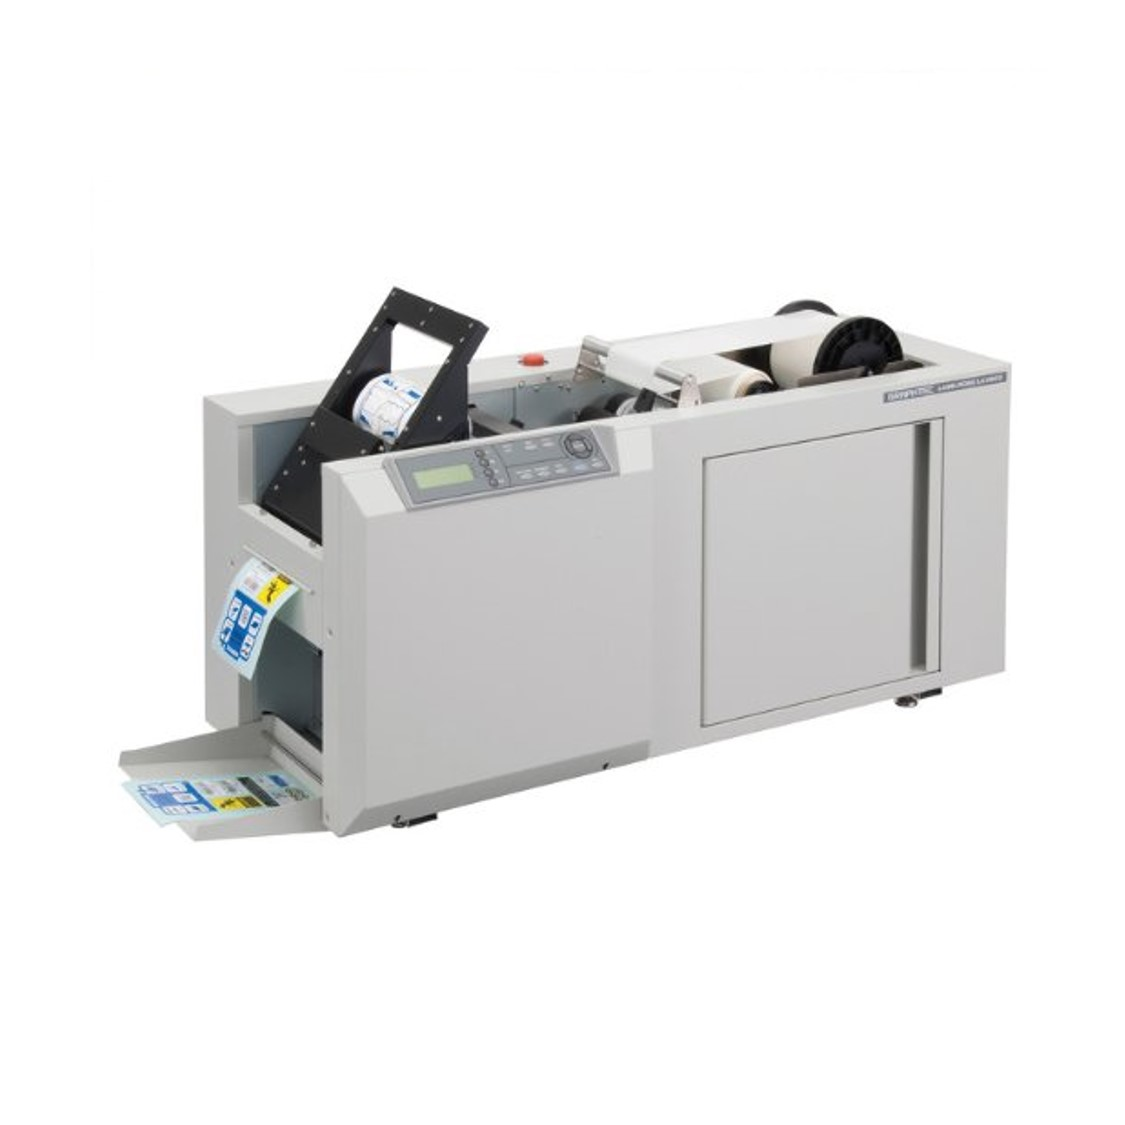 "Graphtec LCX603 Label Printer   Finishing System. Graphtec GB Says "" 8c4bb8b5d7"